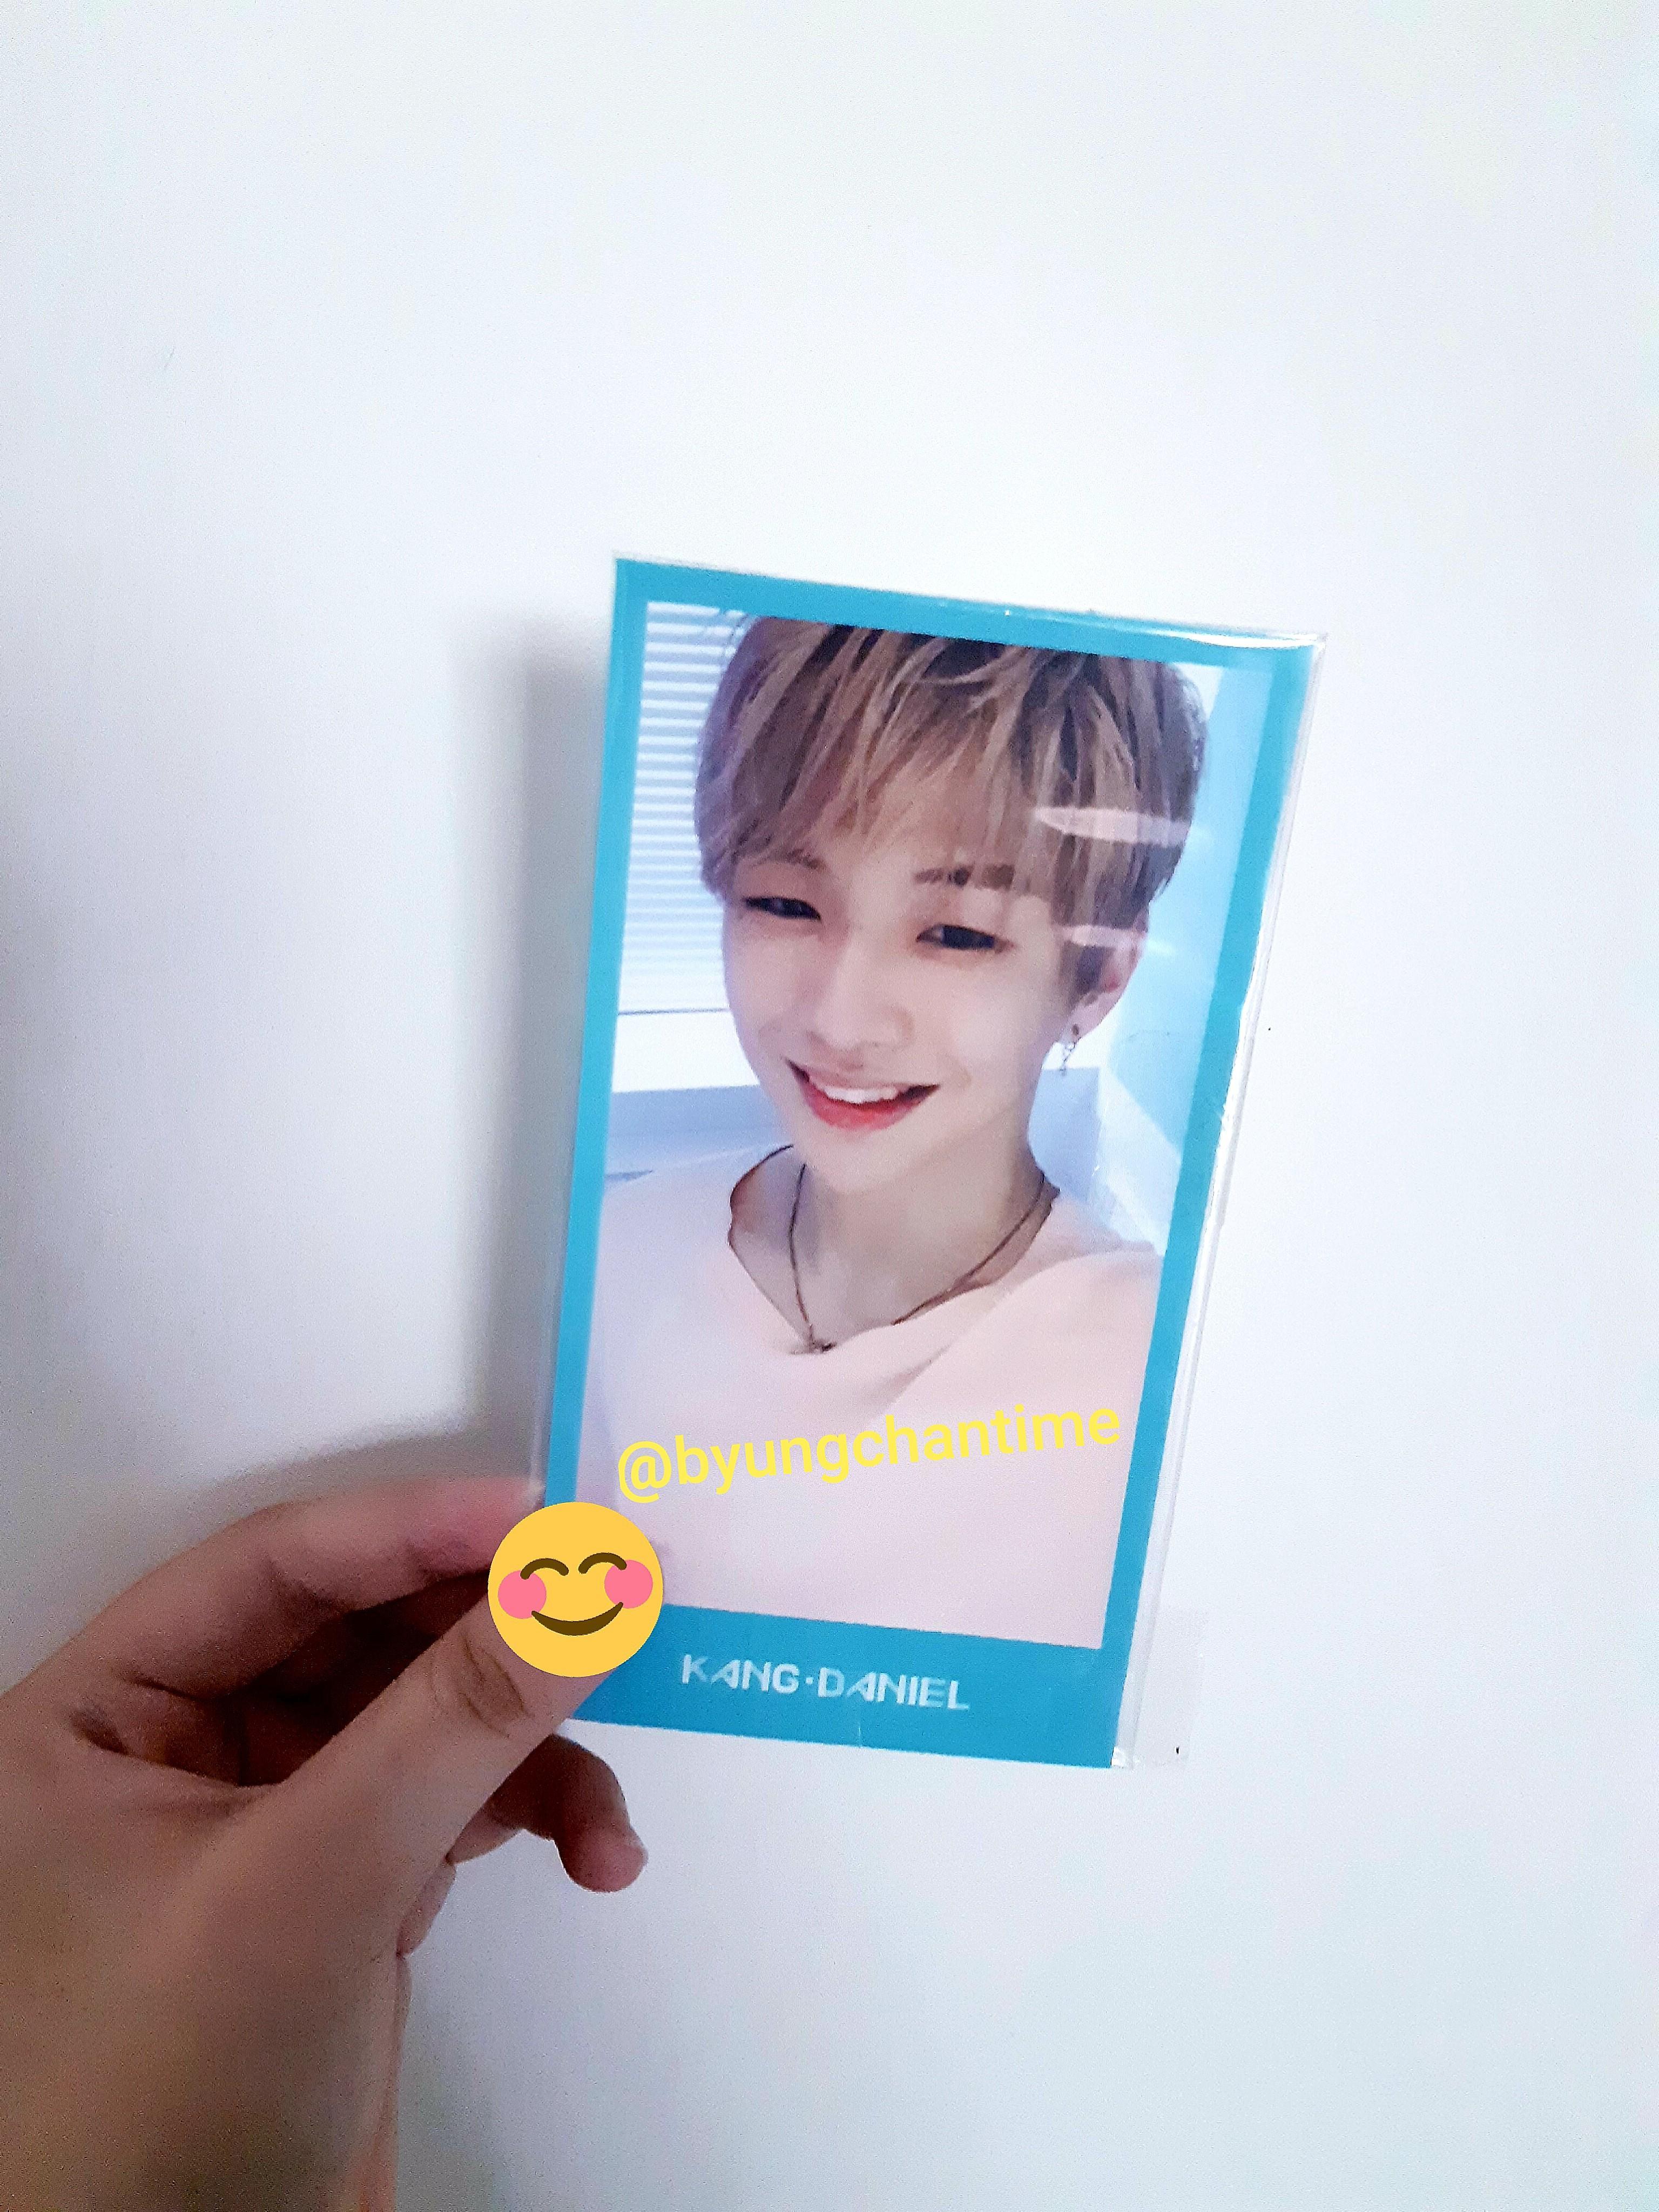 Wanna one Kang Daniel official membership photocard